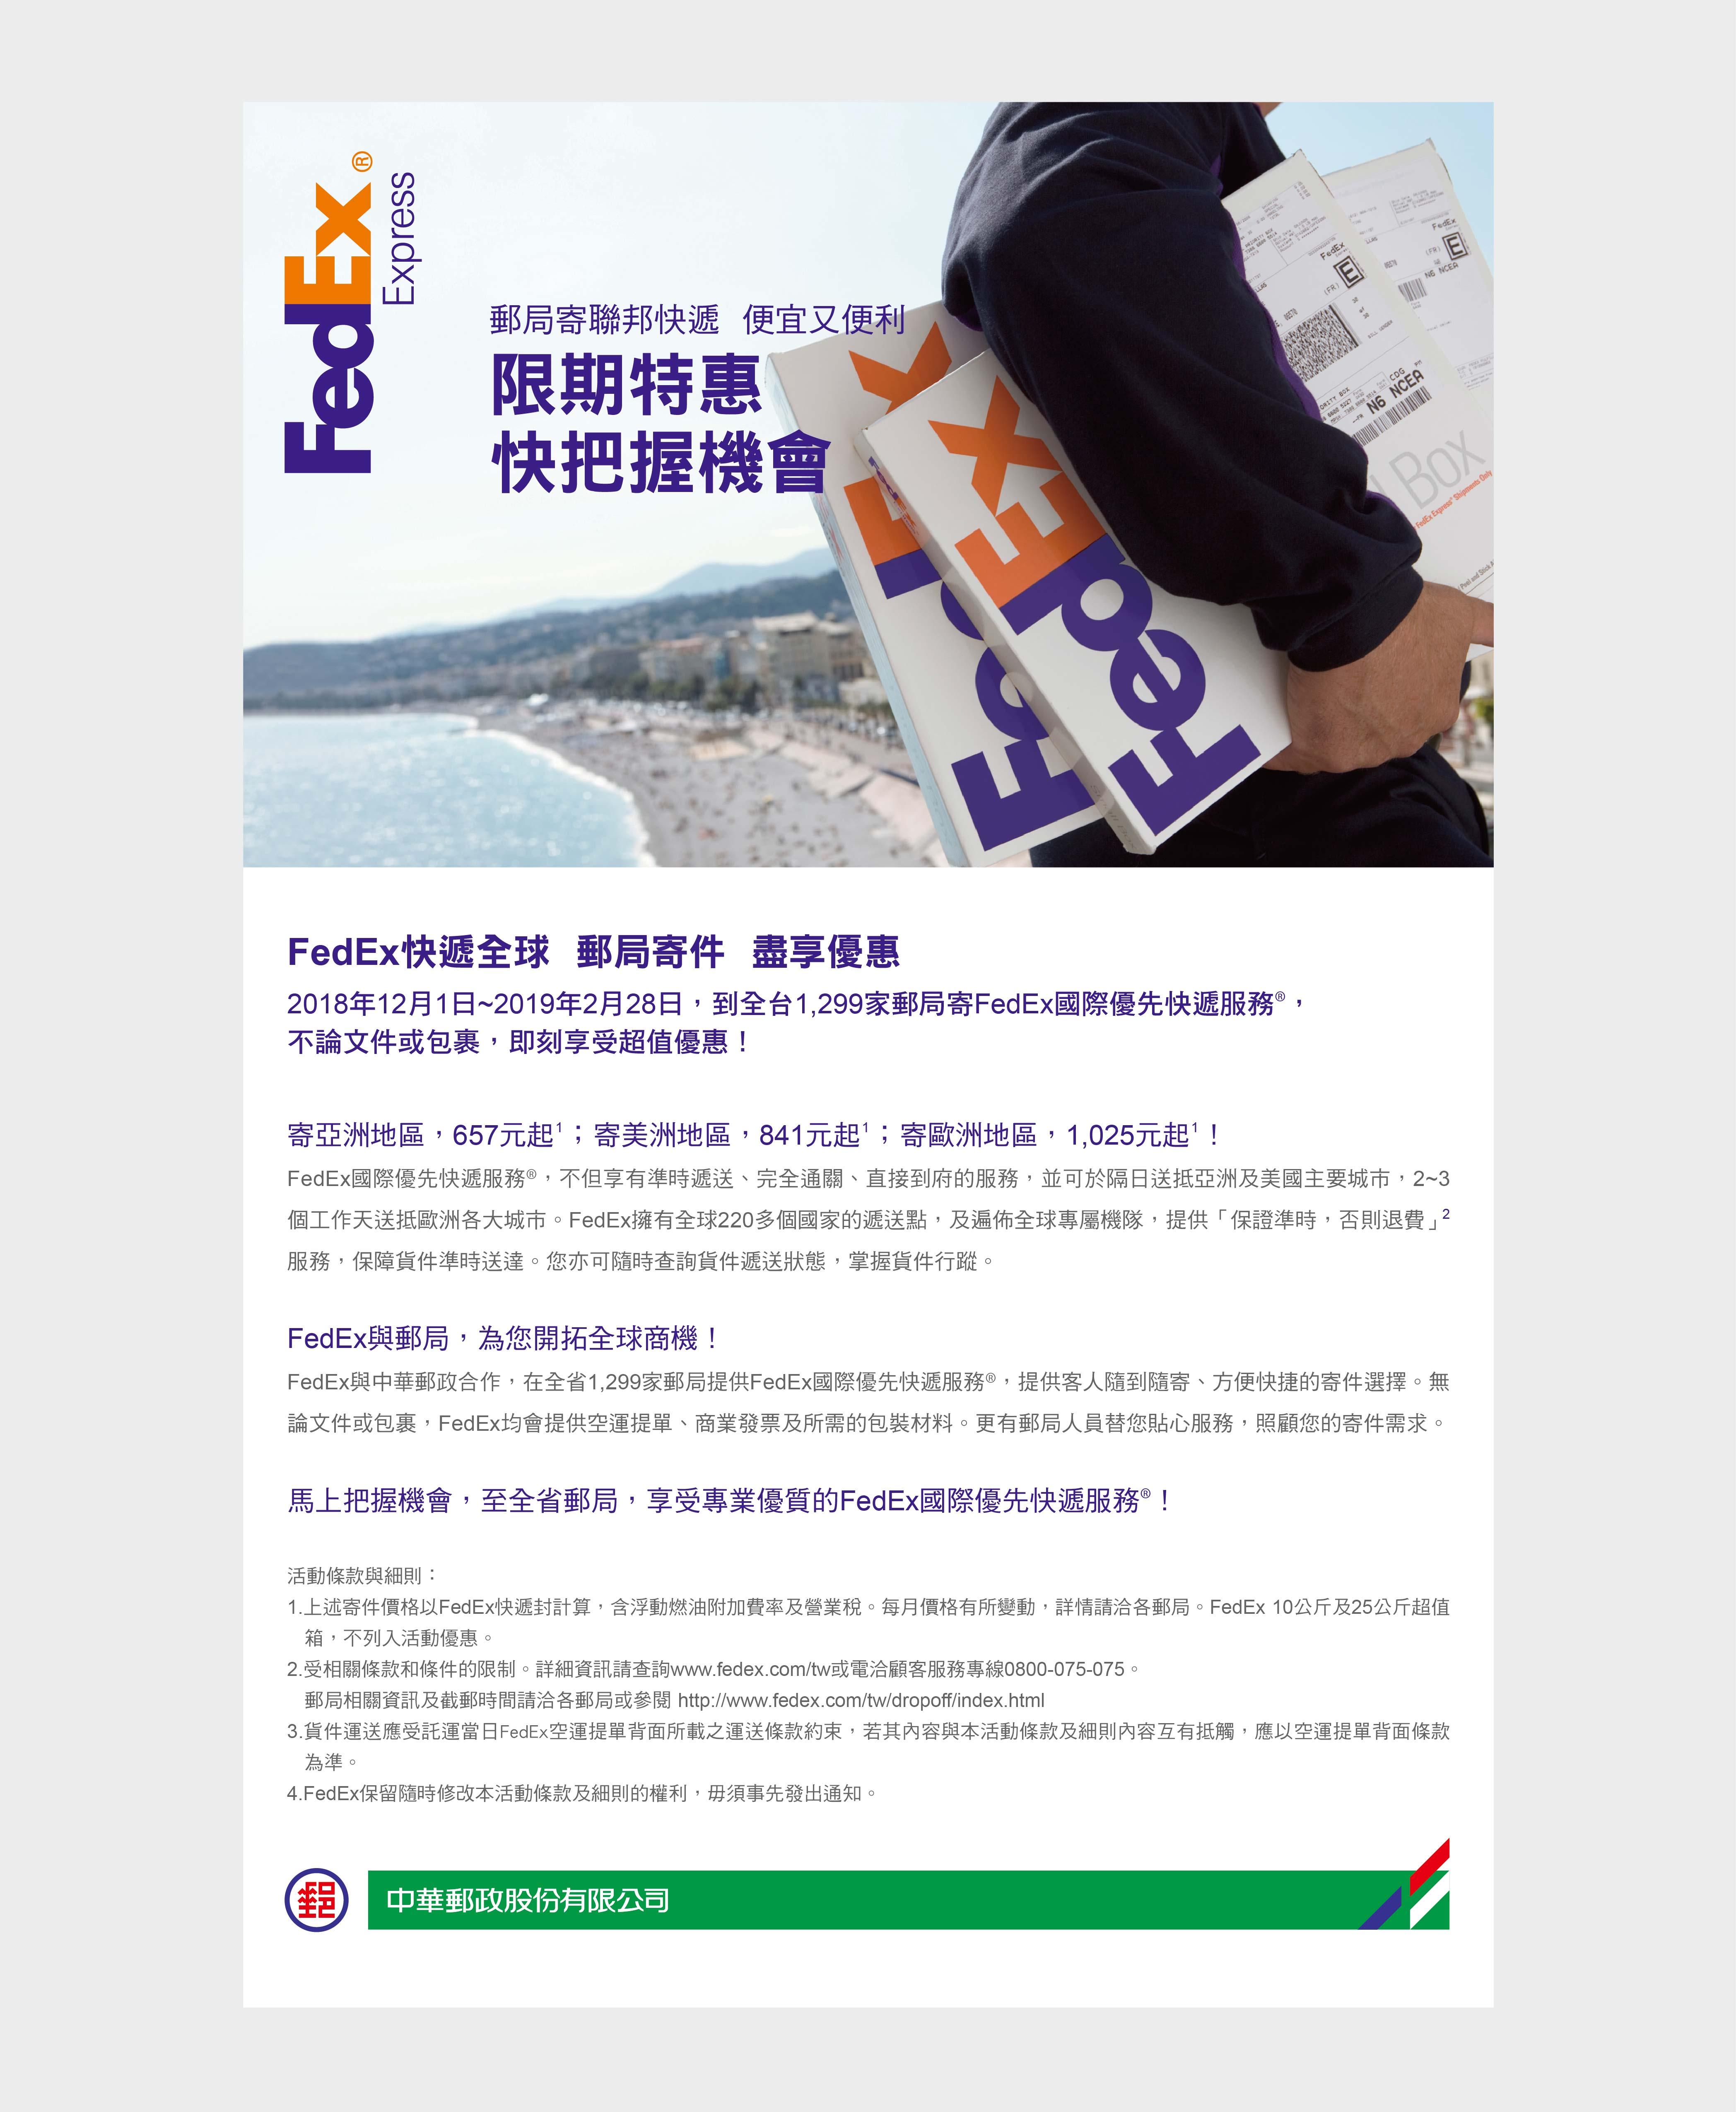 FedEx快遞全球 郵局寄件 盡享優惠